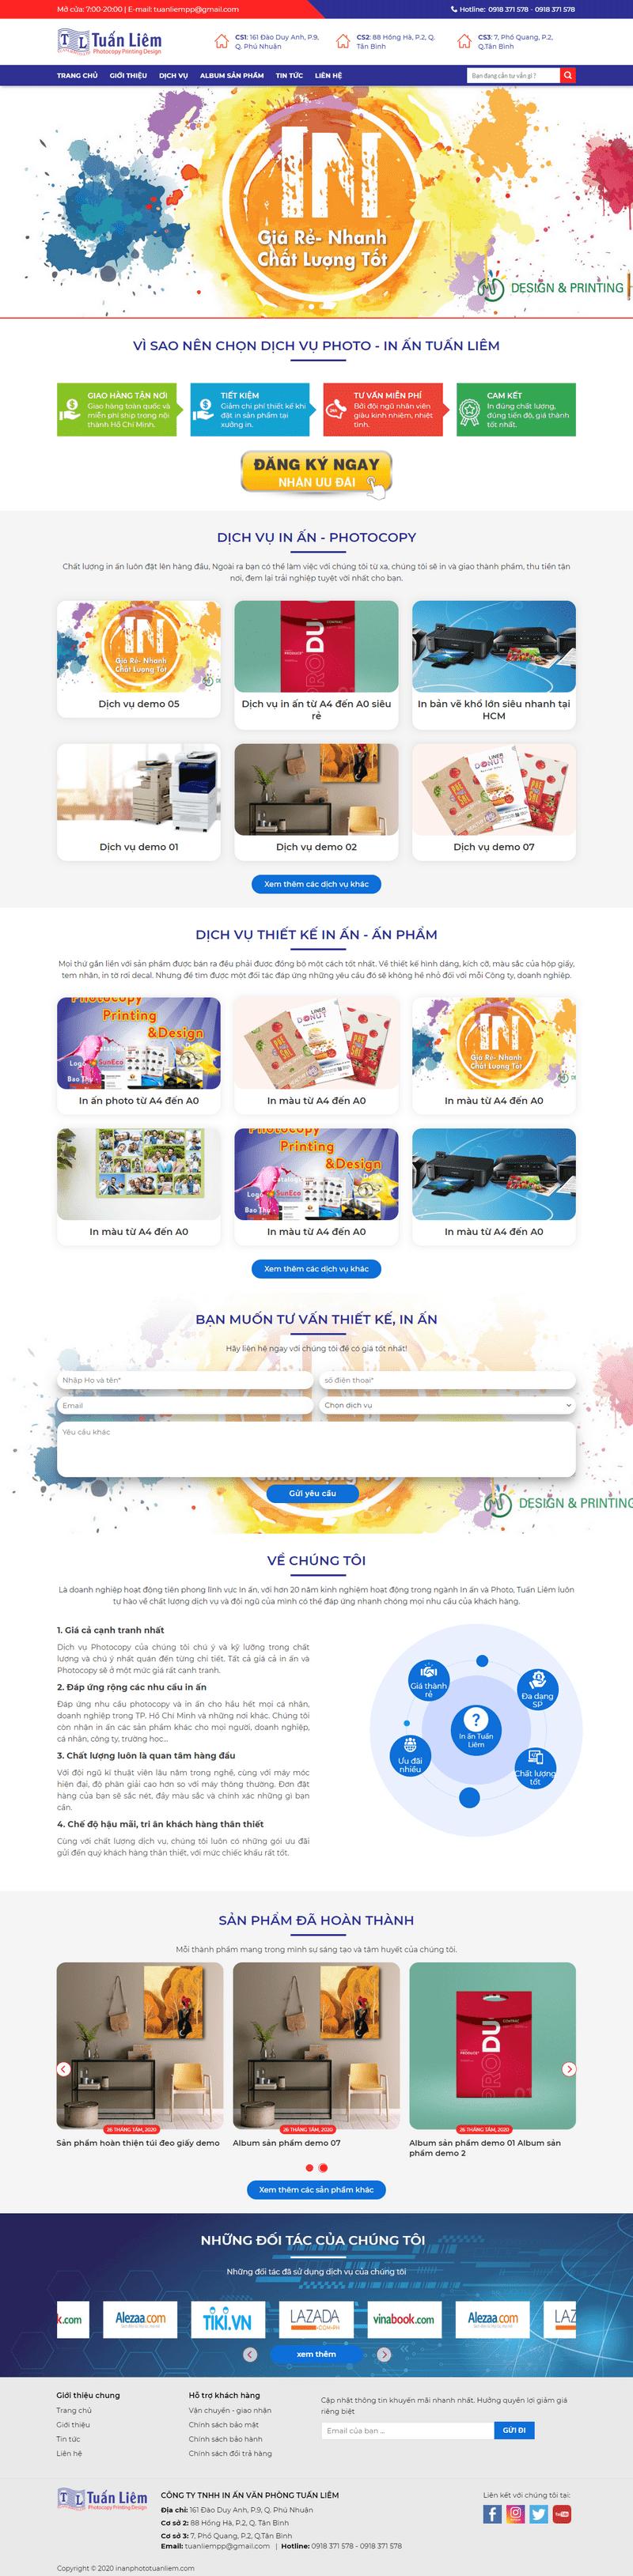 Mẫu web dịch vụ in ấn – photocopy